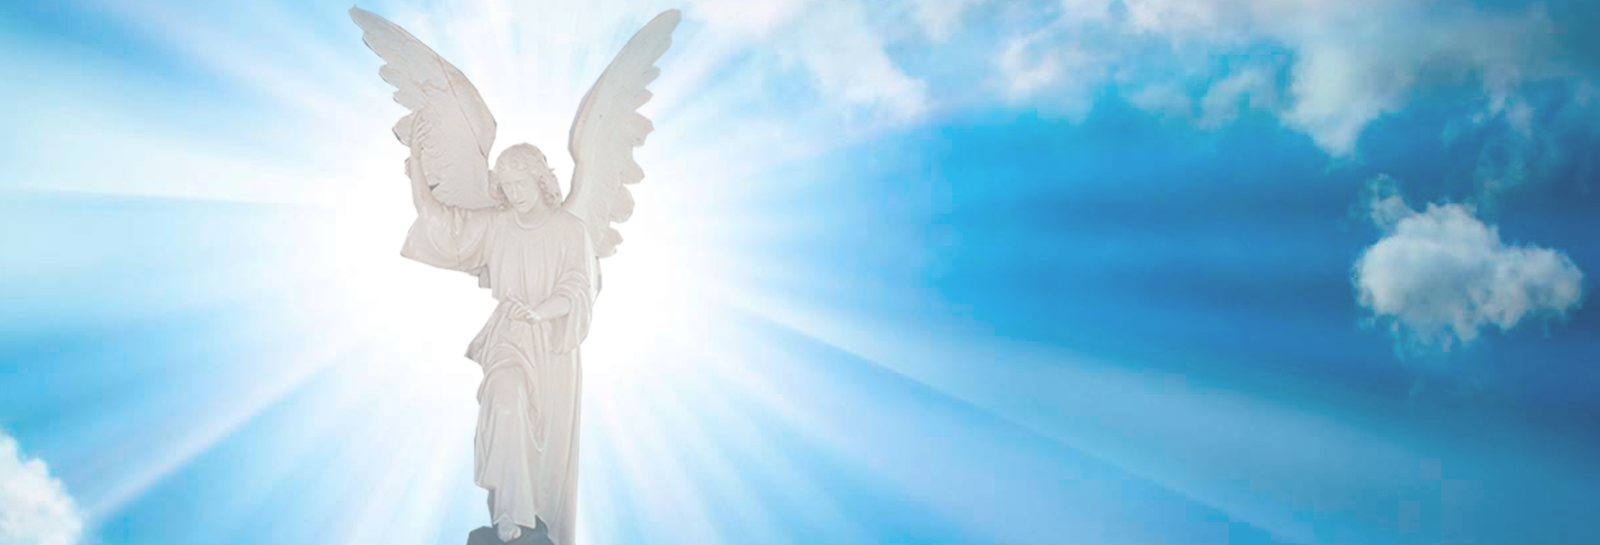 Angel sagrado